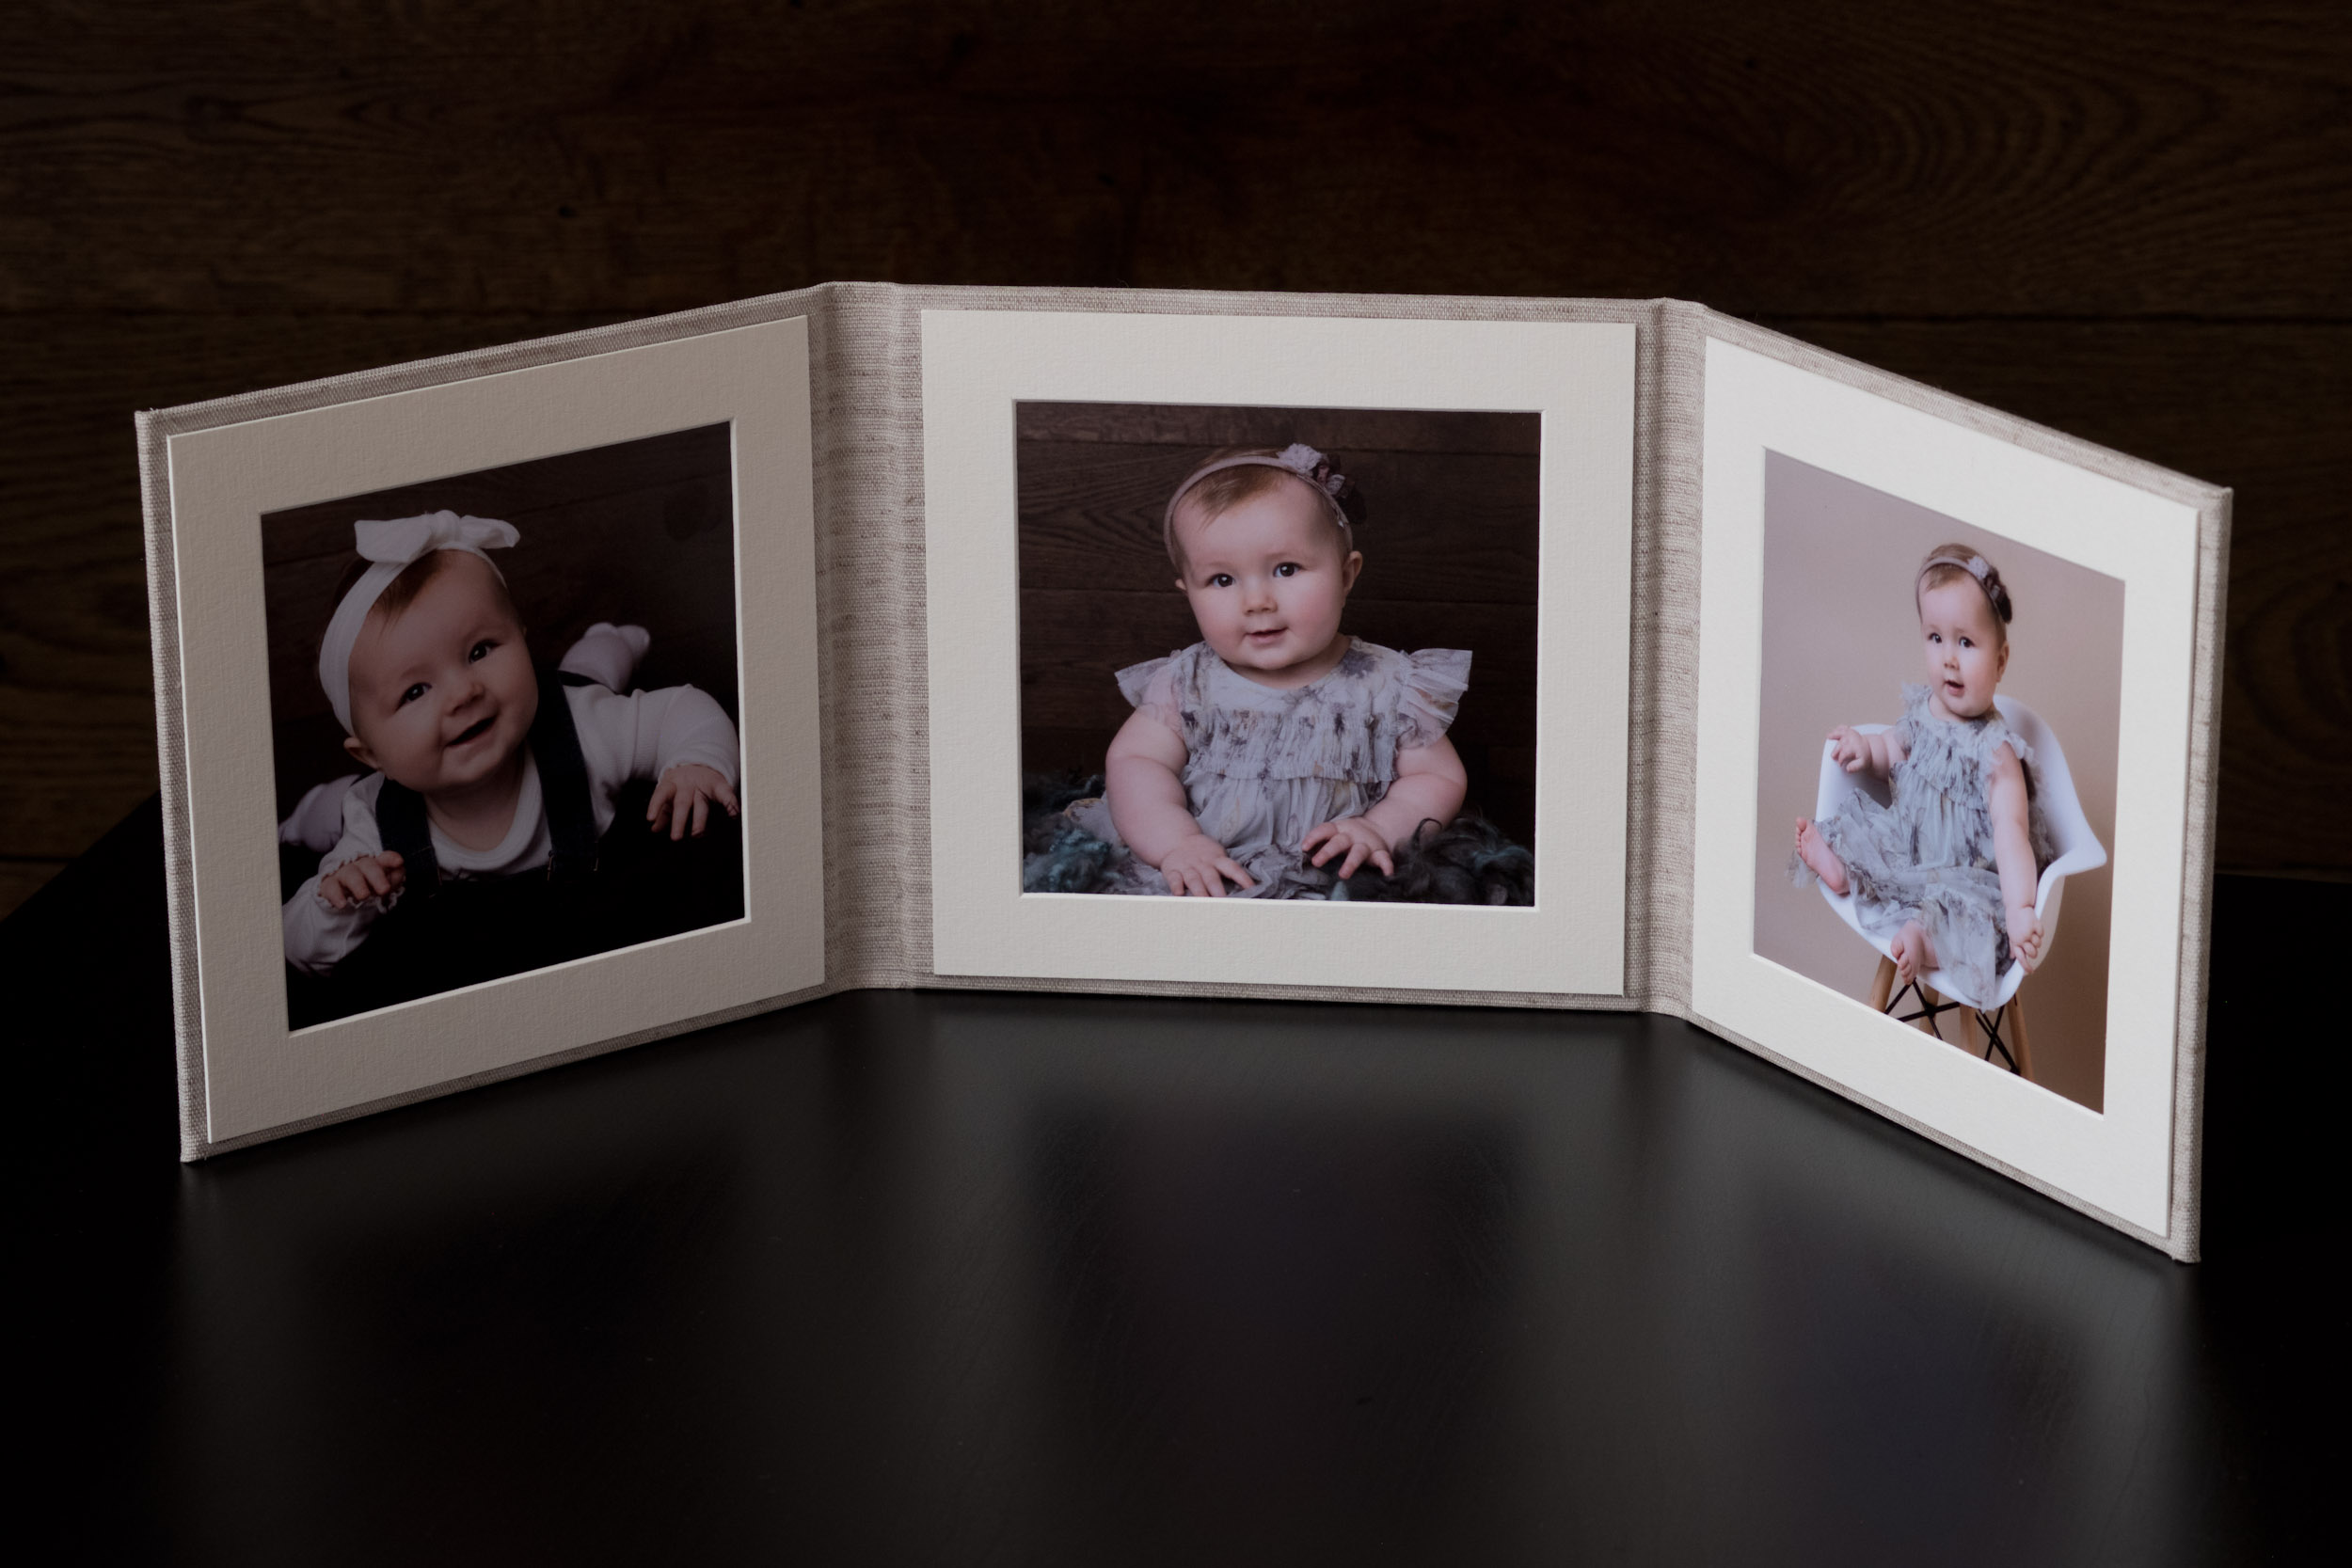 Newborn-Photography-Lincoln-Trio-Display-Folio-006.jpg